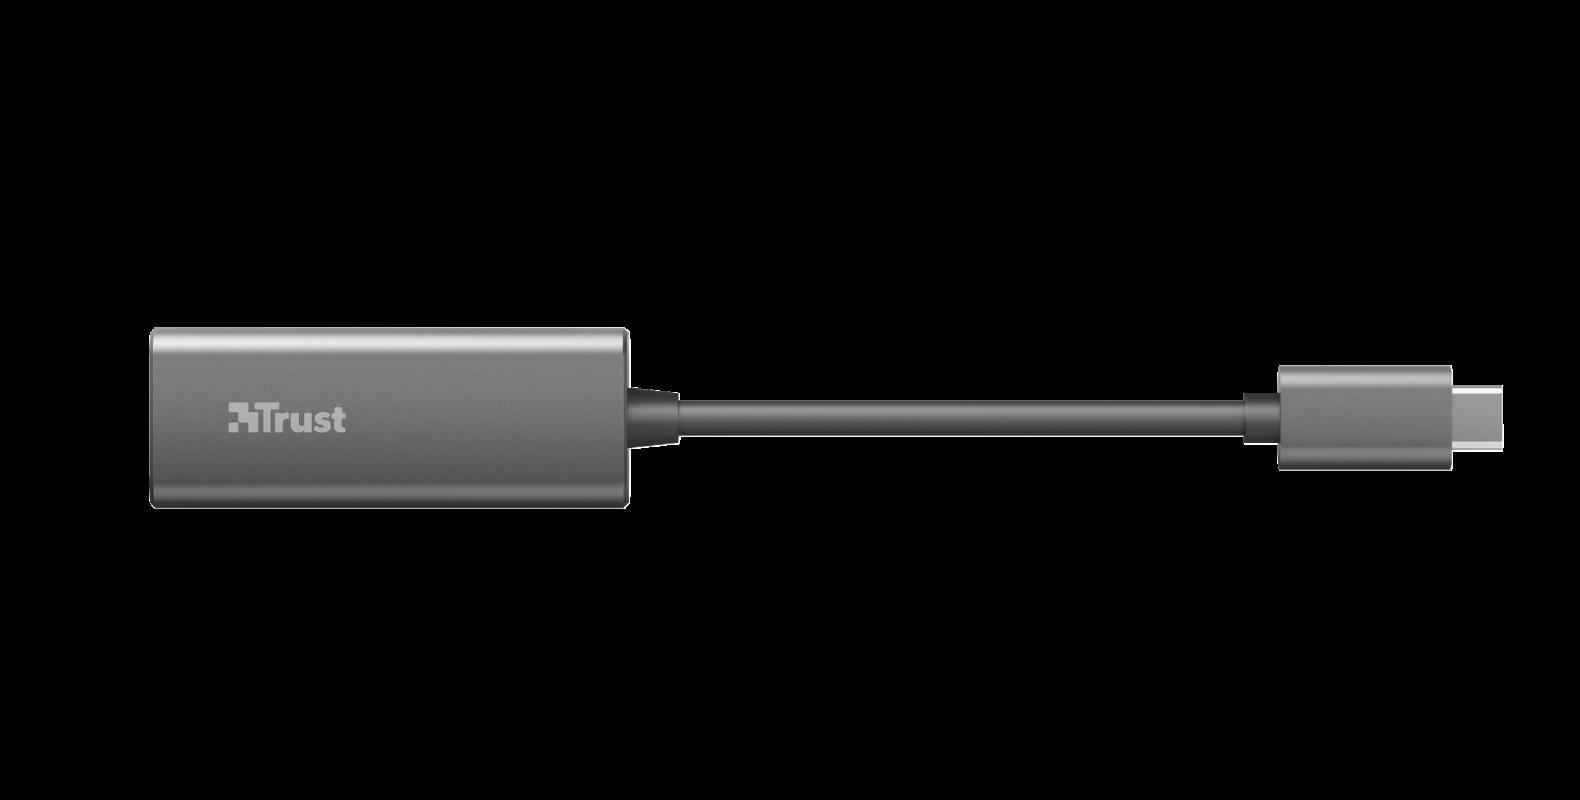 Adaptor Trust Dalyx USB-C to Ethernet Adapter - imaginea 7